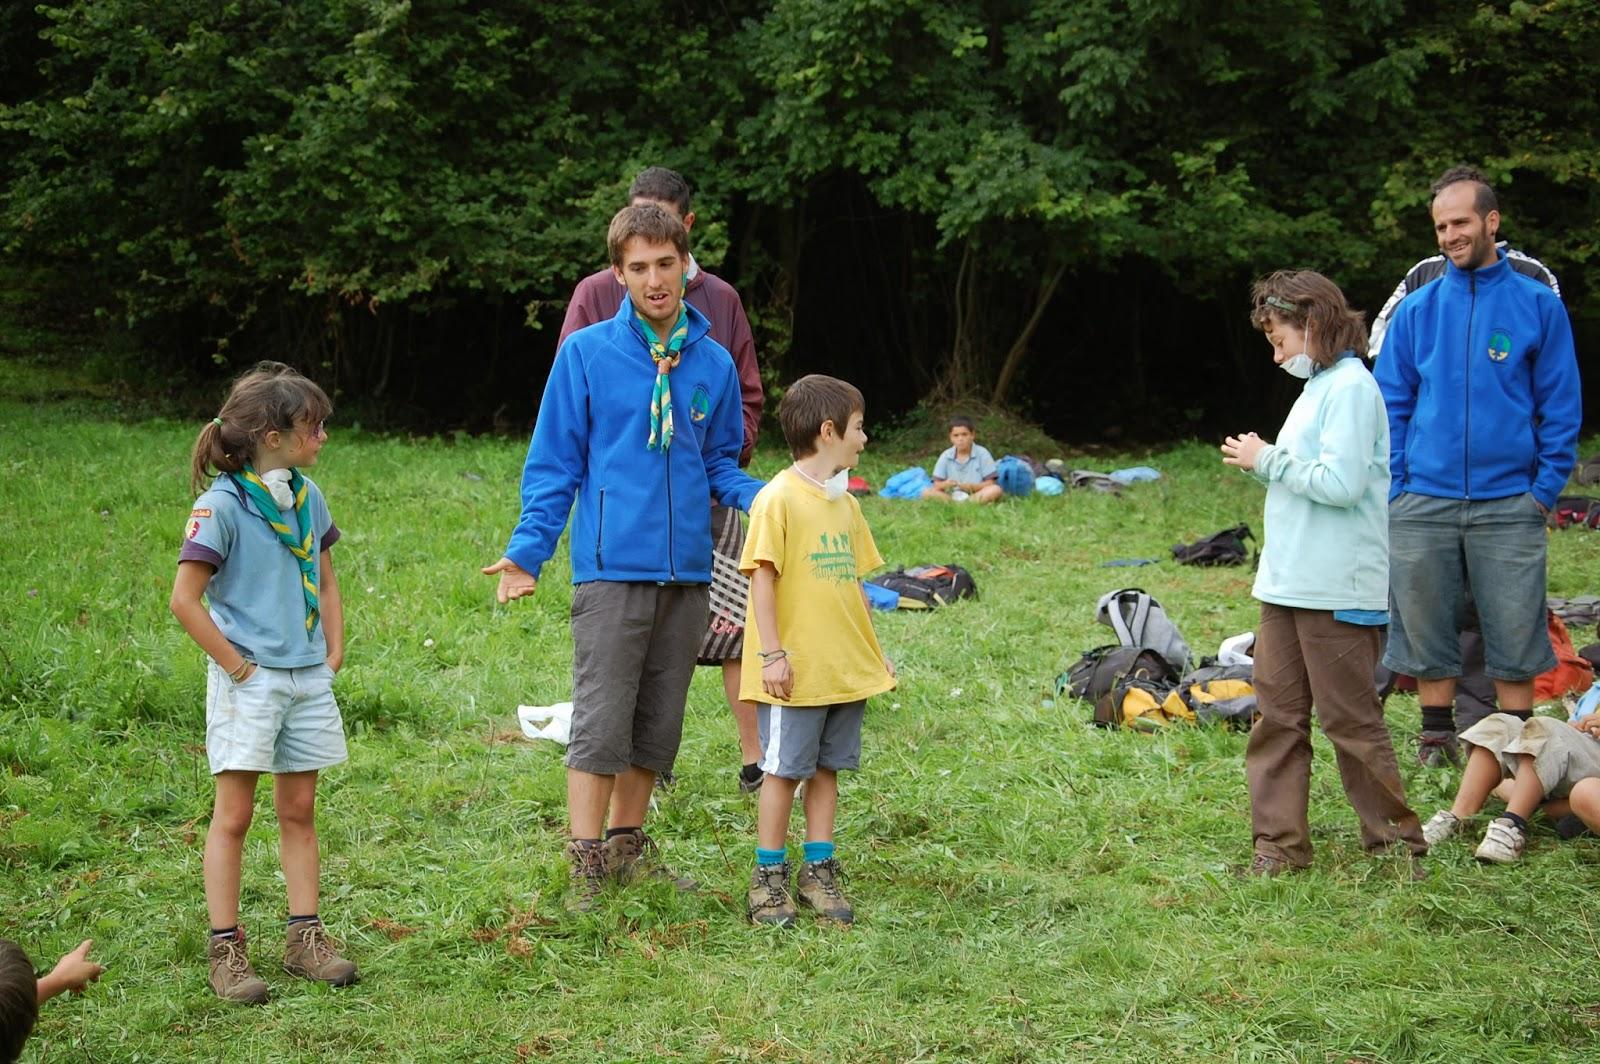 Campaments Estiu RolandKing 2011 - DSC_0218%2B2.JPG